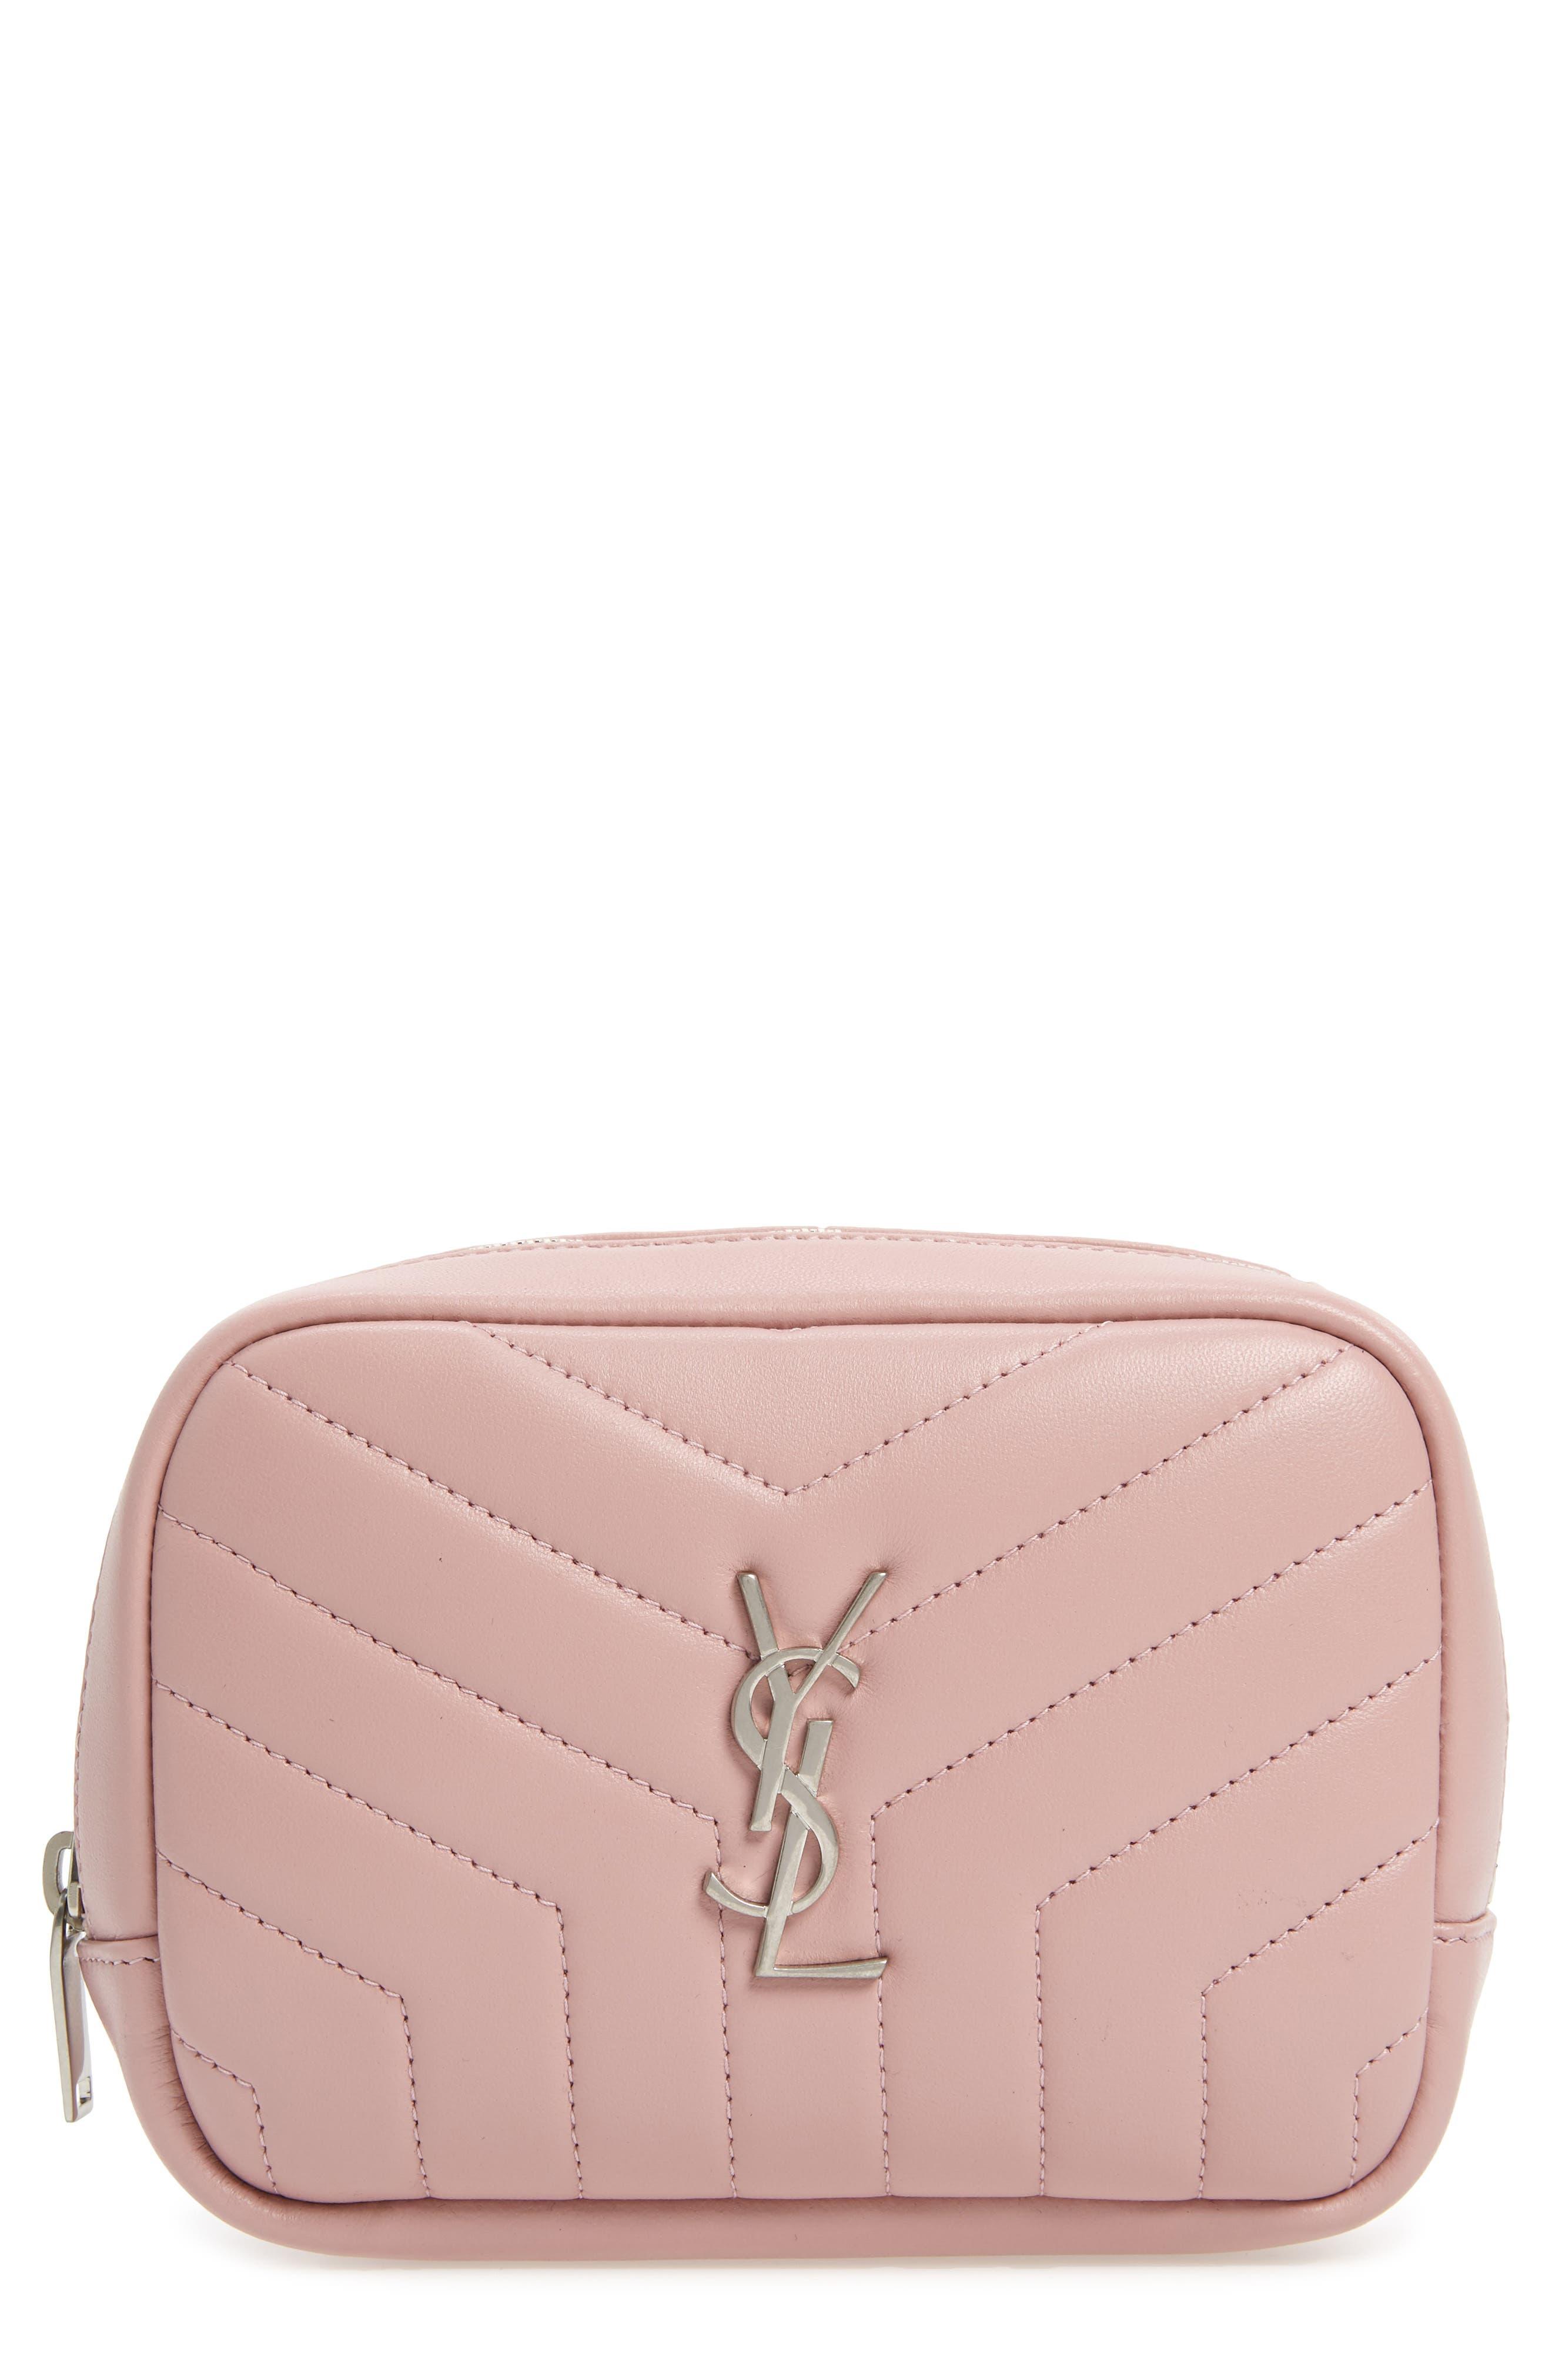 Loulou Matelassé Leather Cosmetics Bag,                             Main thumbnail 1, color,                             Tender Pink